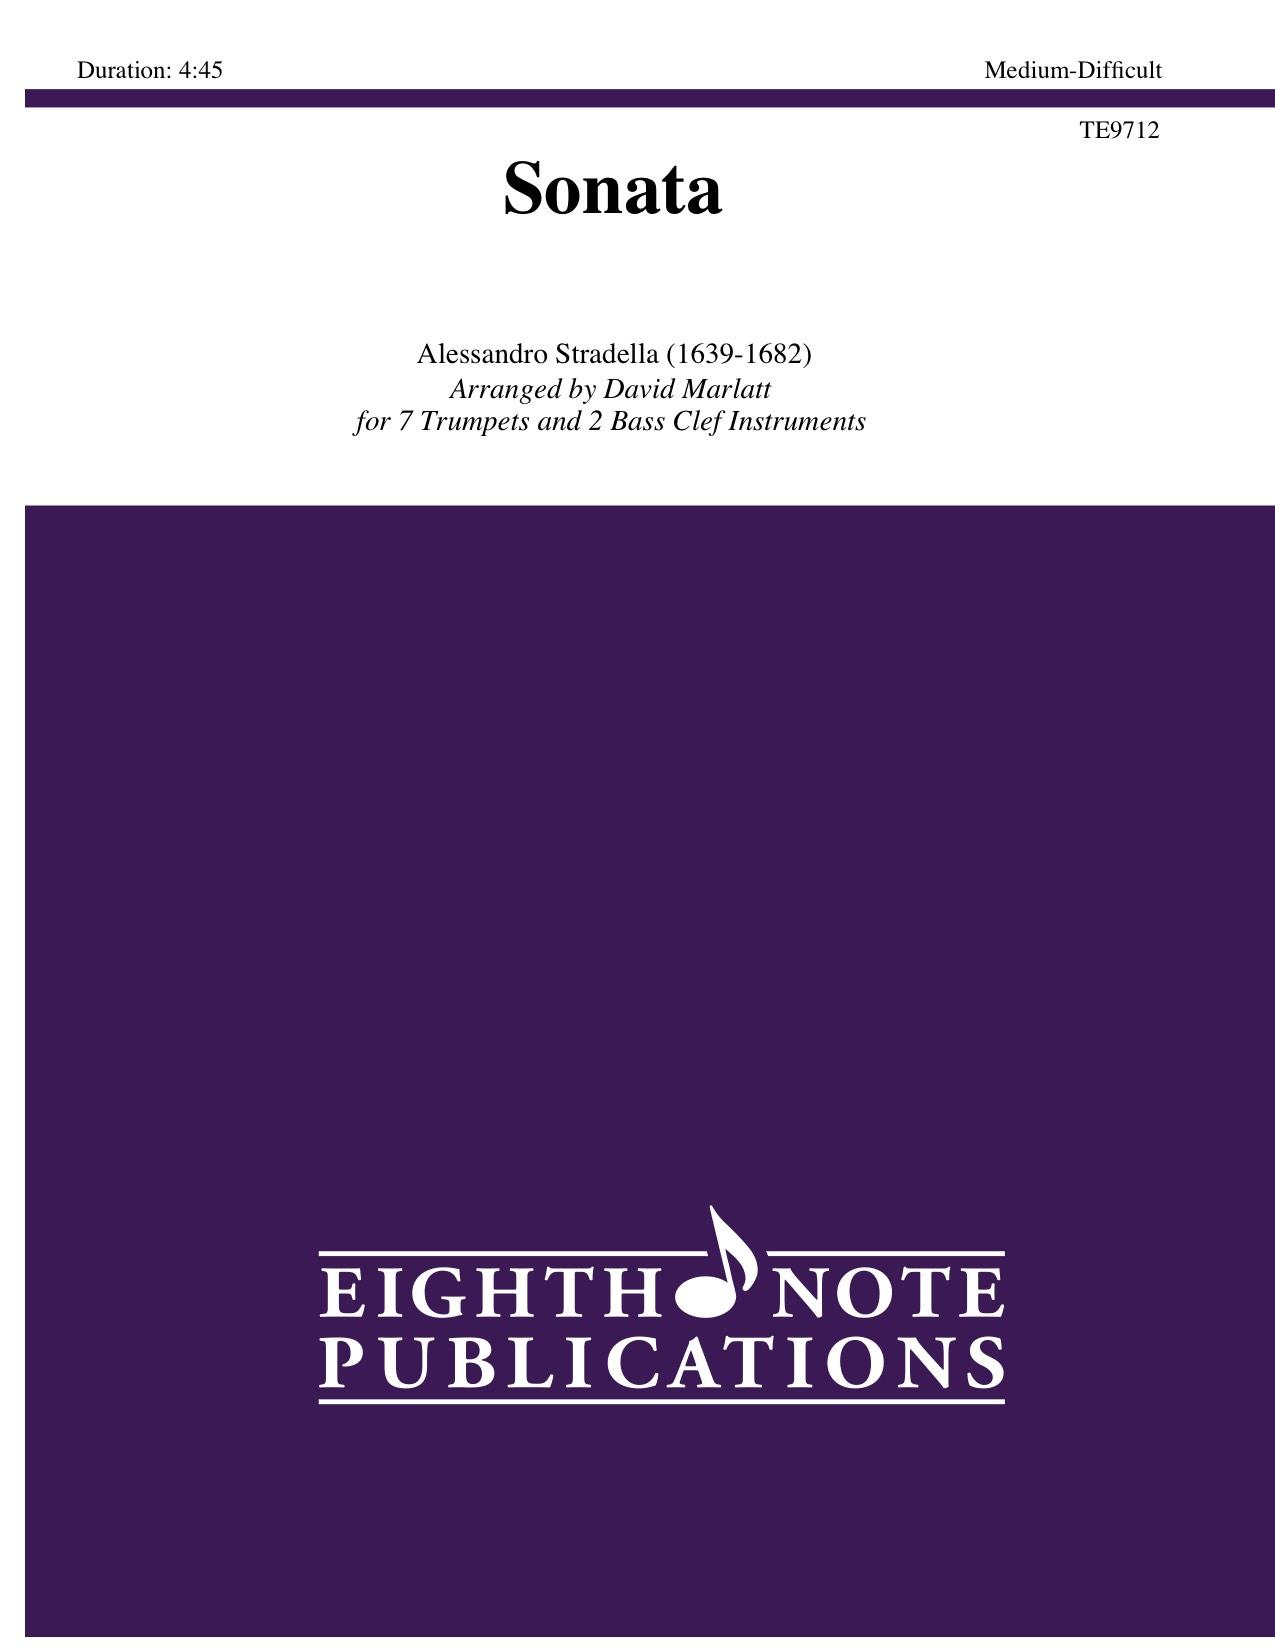 Sonata  - Alessandro Stradella